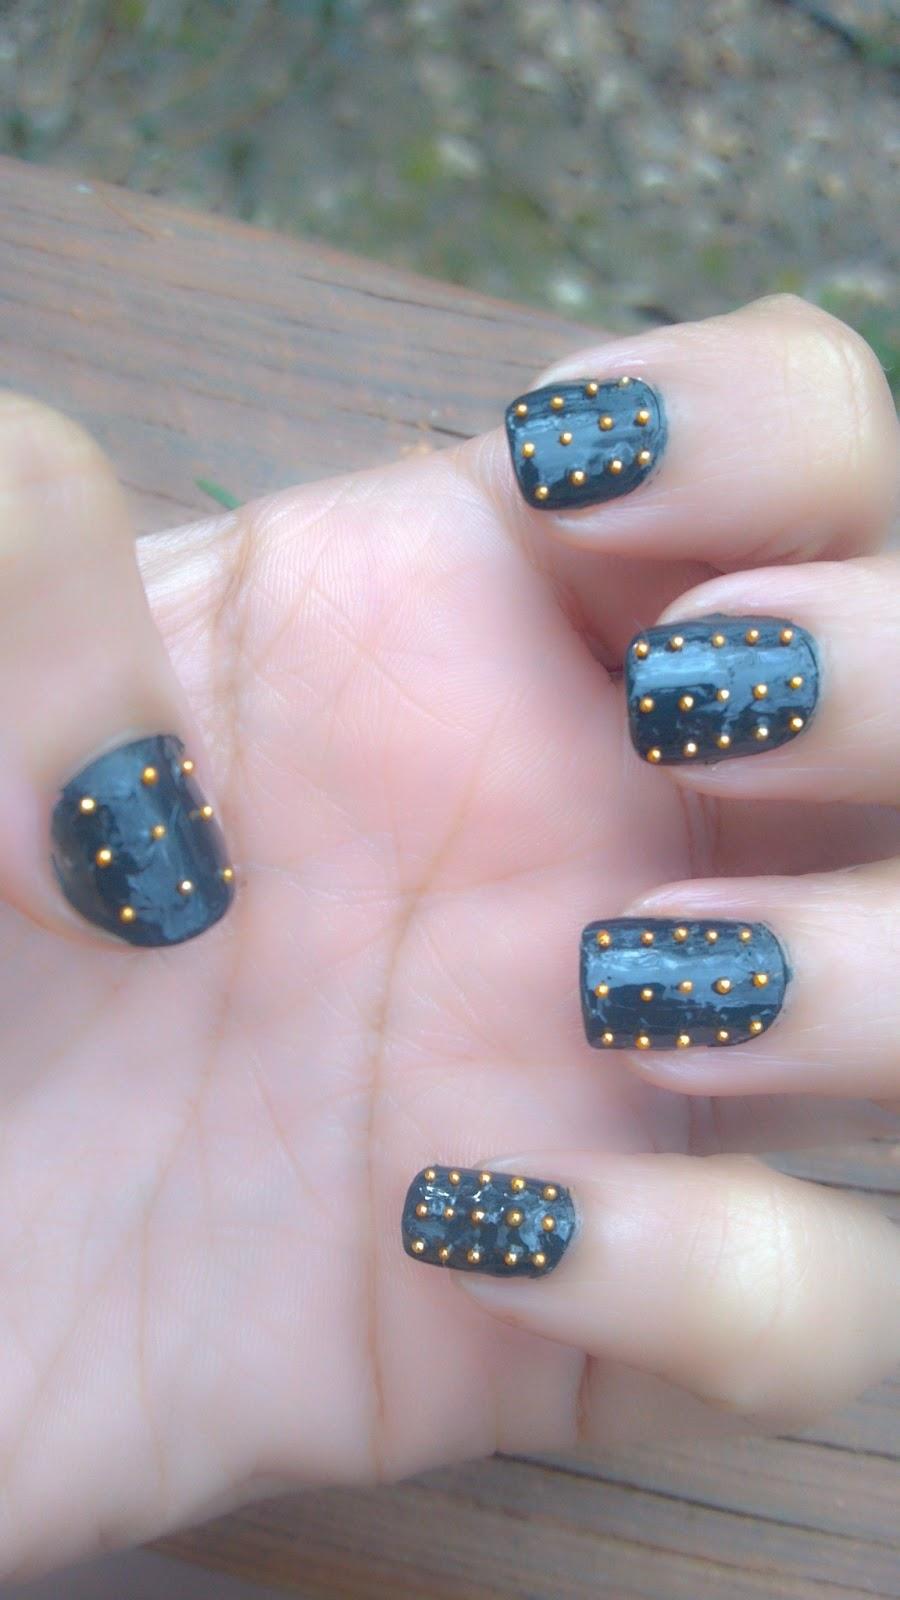 Notd Spiked Nails With Essie Stylenomics Michelle Beltre